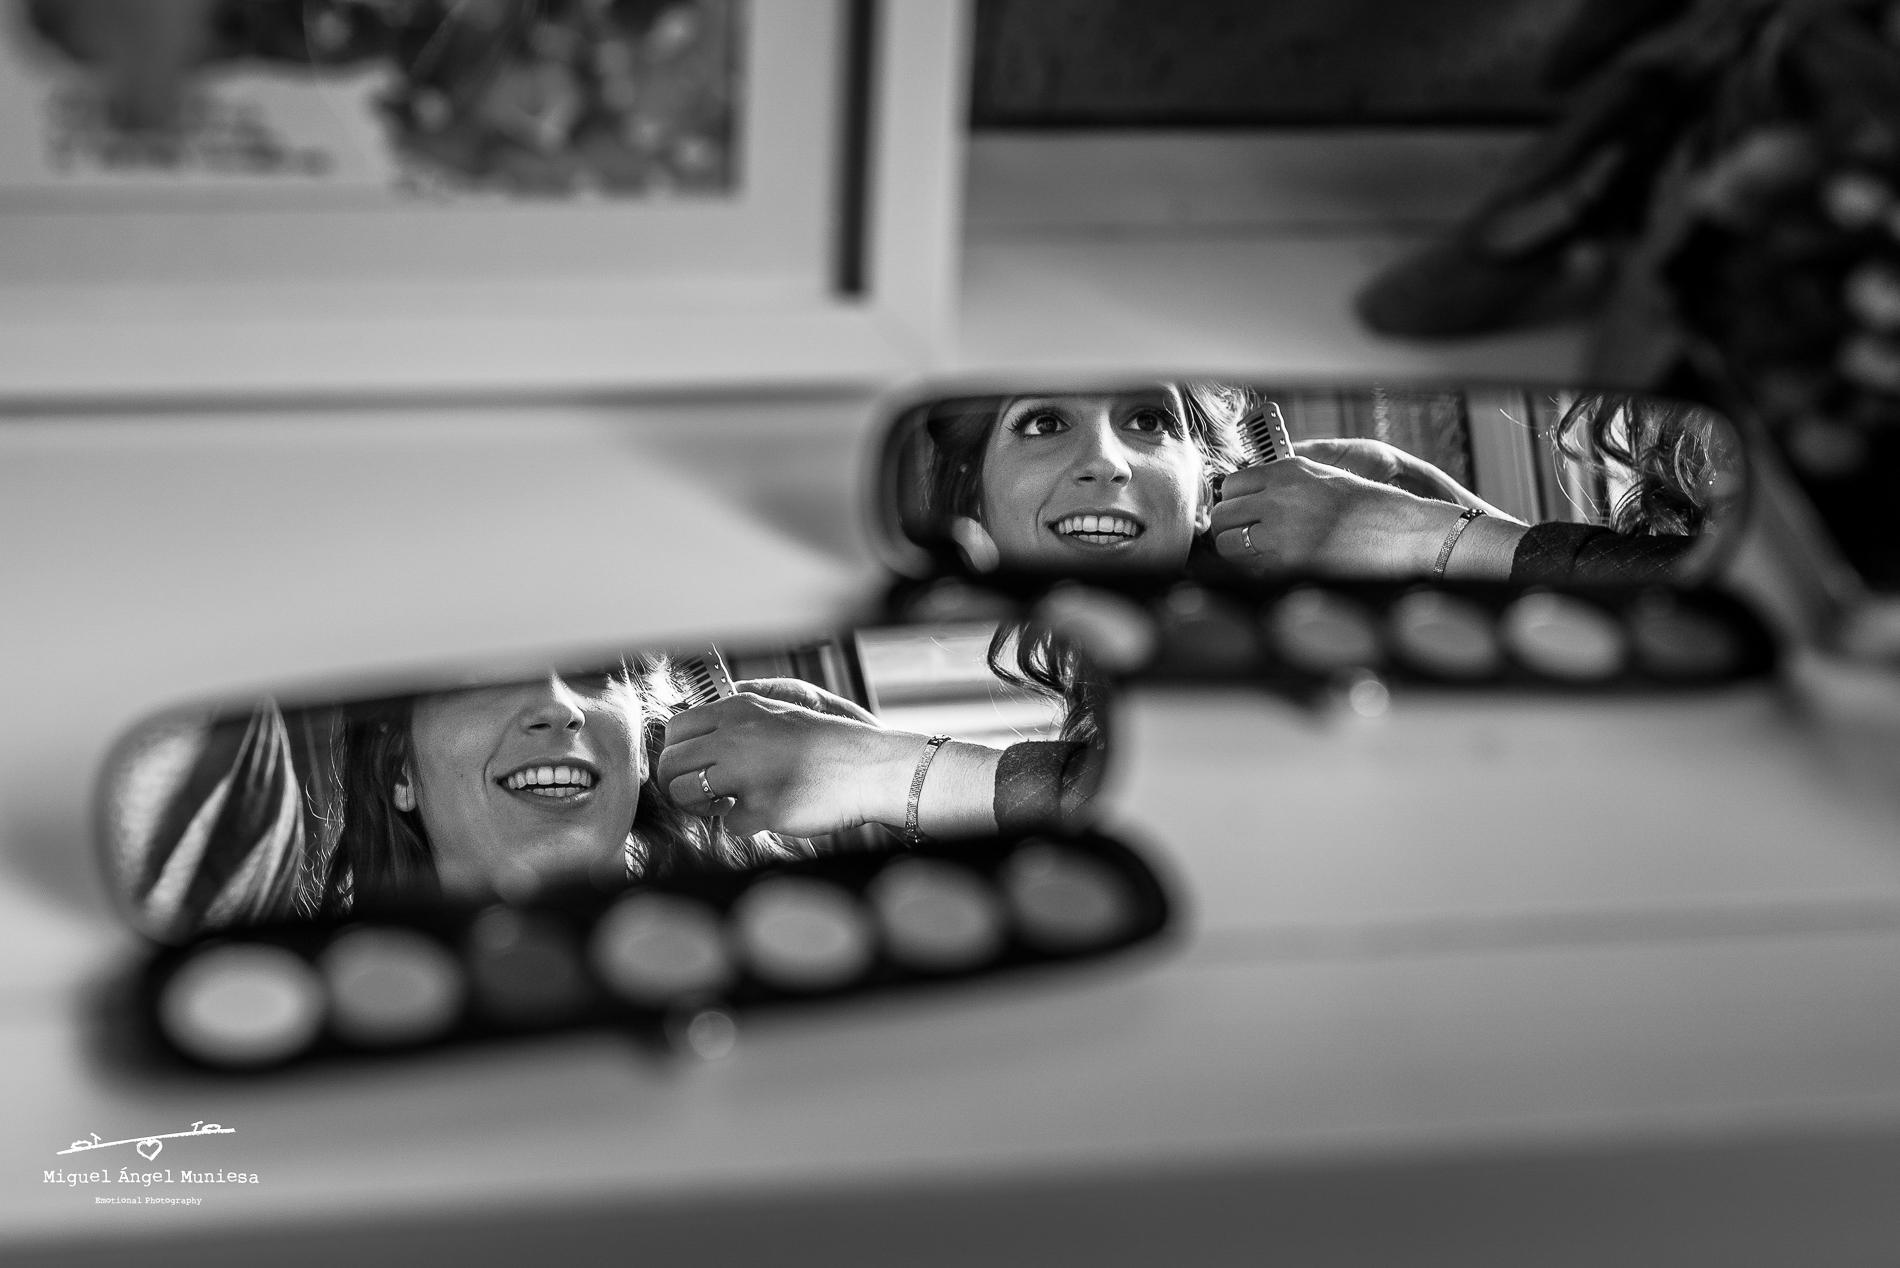 miguel angel muniesa, fotografo boda Teruel, fotografo boda navarra, fotografo boda zaragoza, fotografo boda soria, miguel angel muniesa emotional photography_02